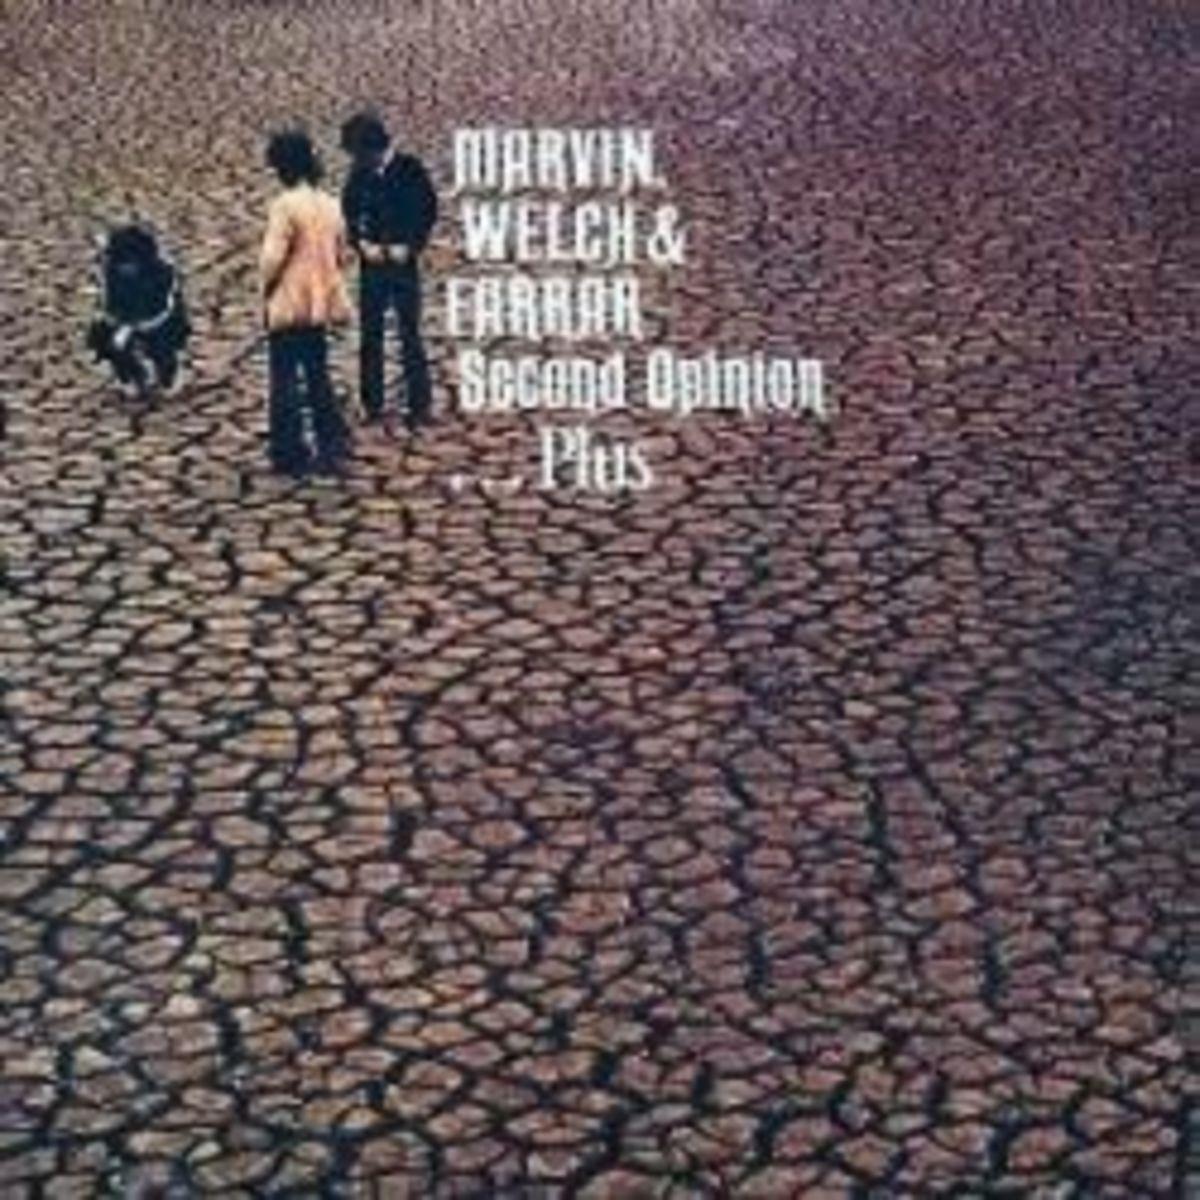 Second Opinion Marvin Welch Farrar